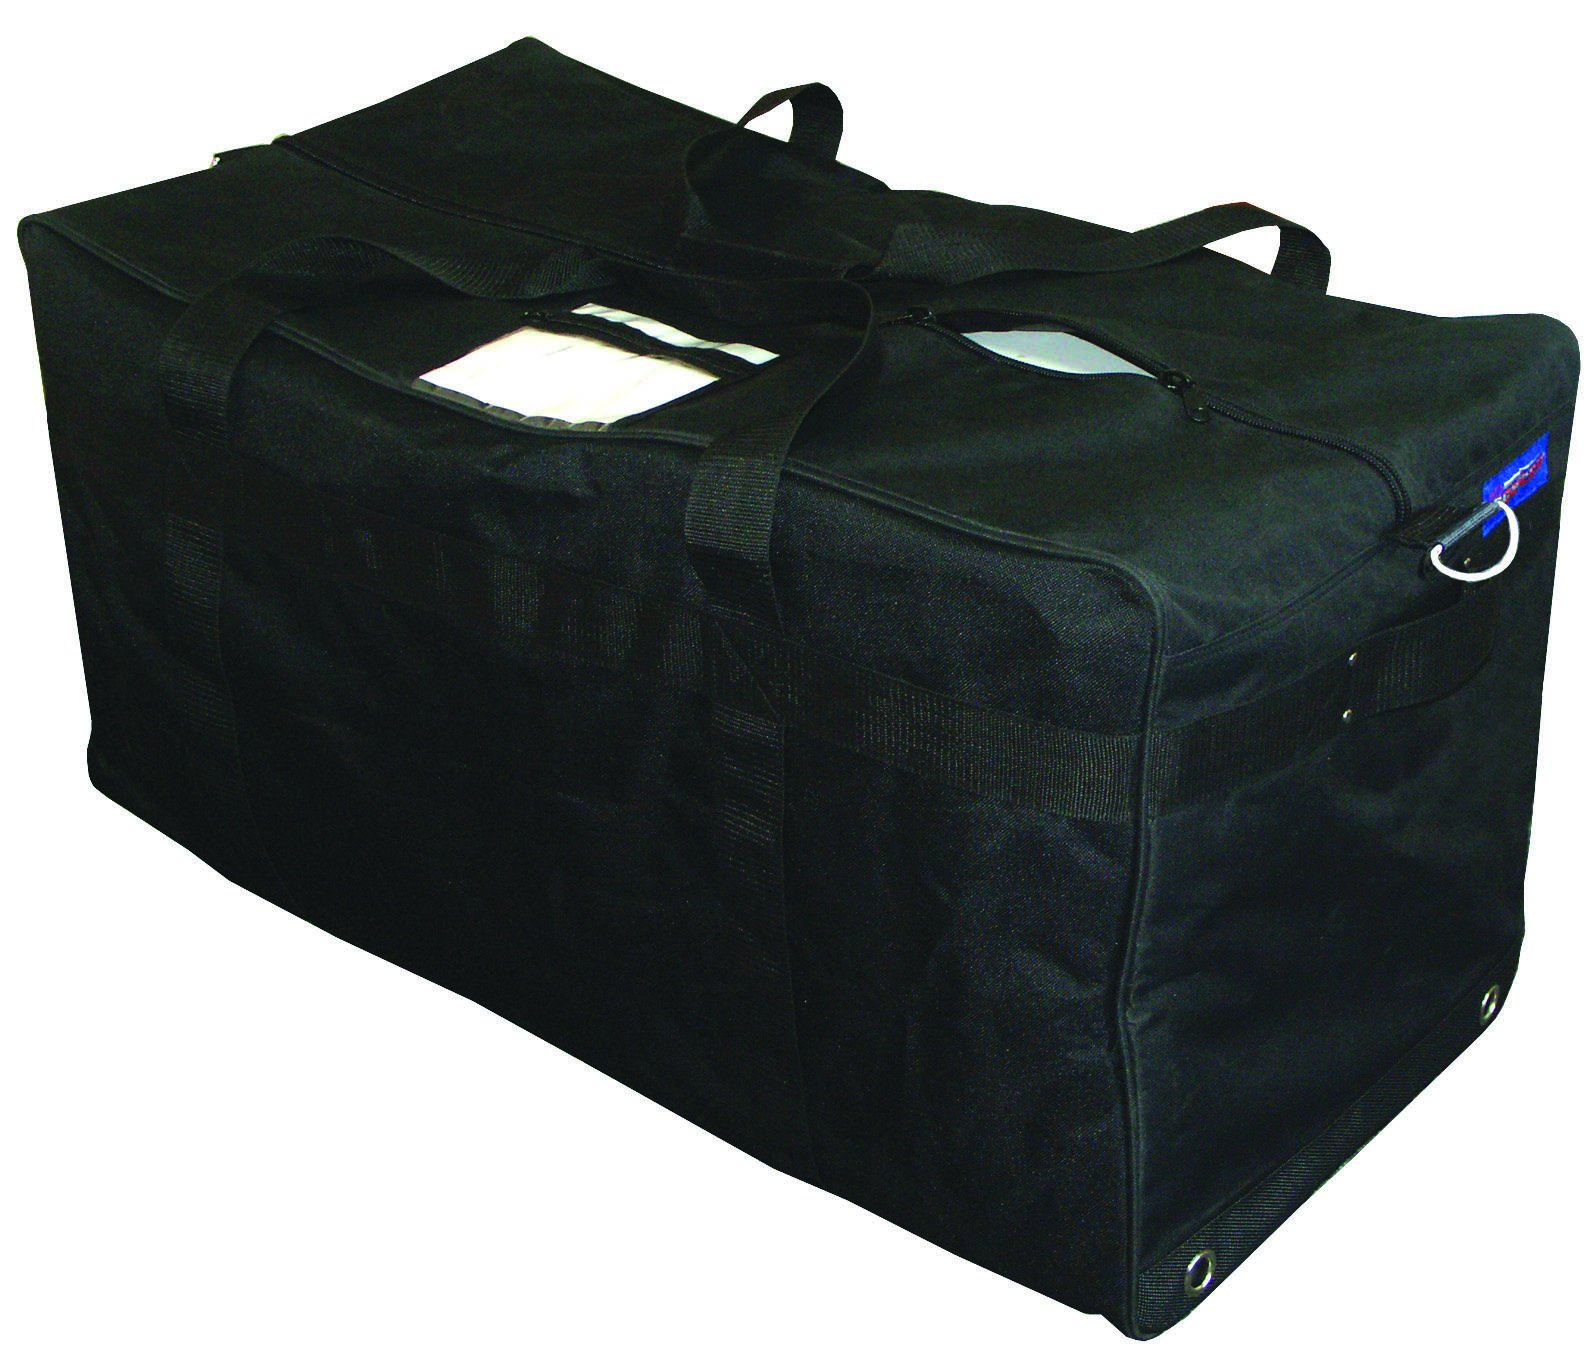 Proguard Team Bag, Black, 36-Inch